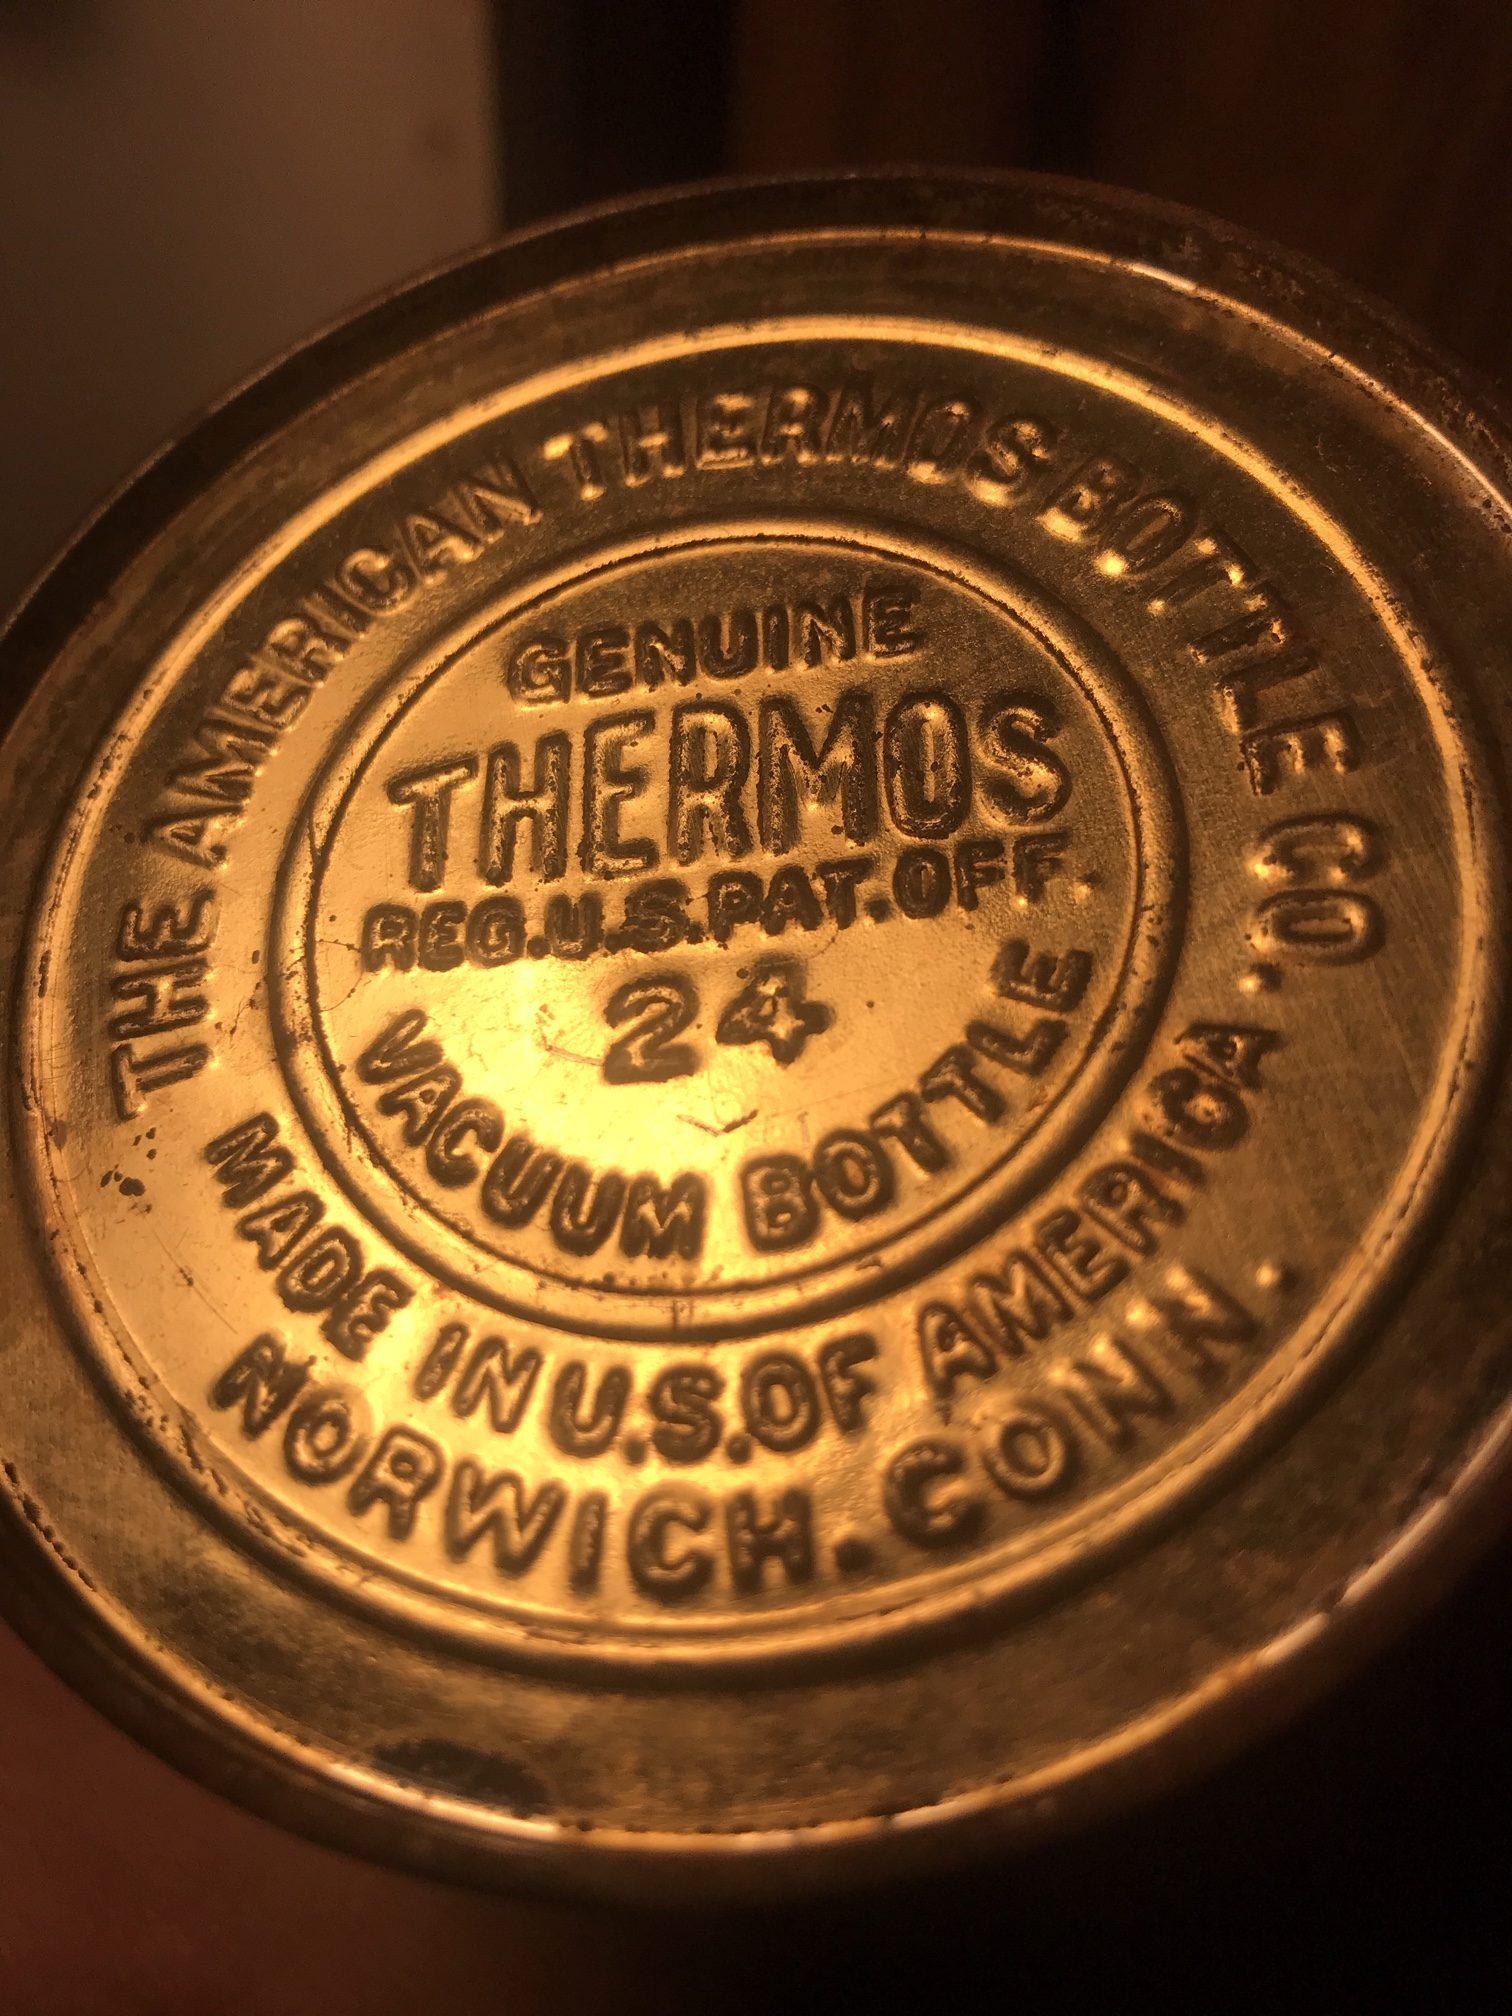 Thermos Bottle Bottom